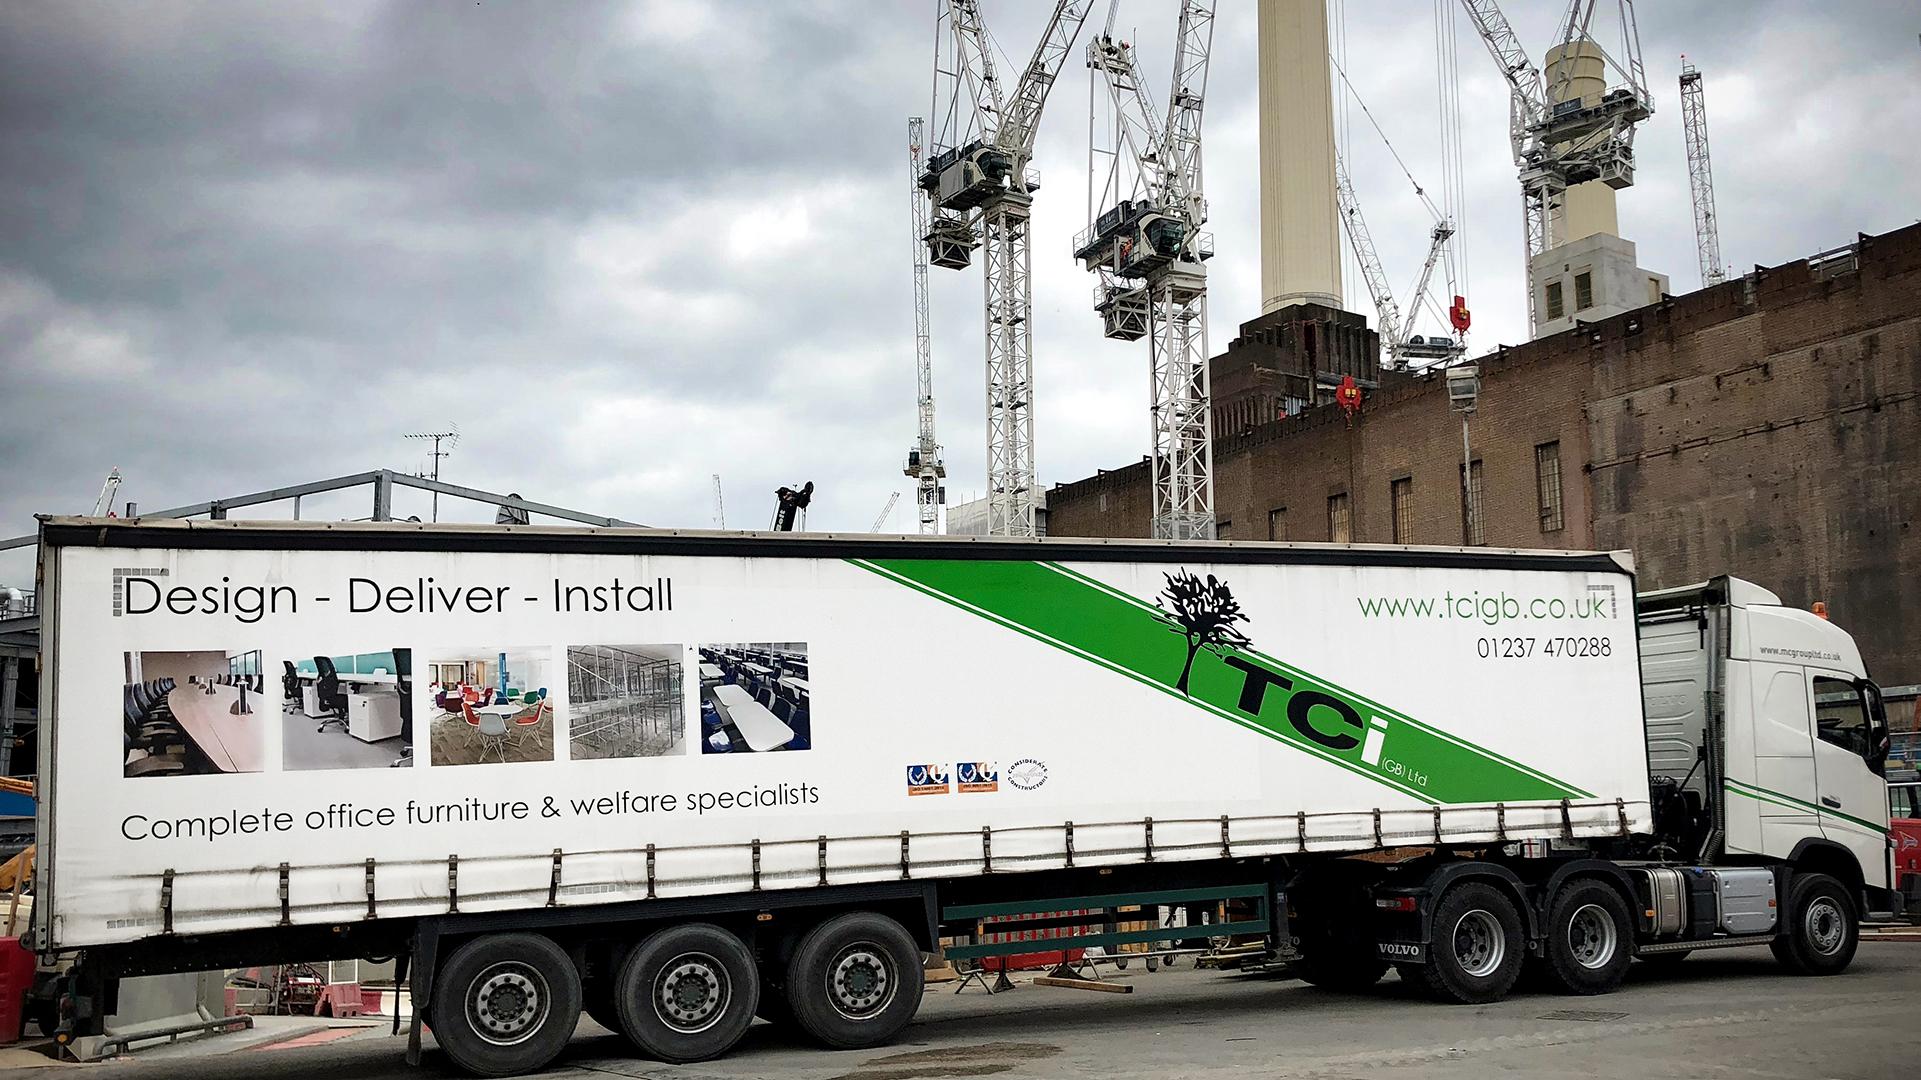 Battersea Power Station Redevelopment – Phase 2